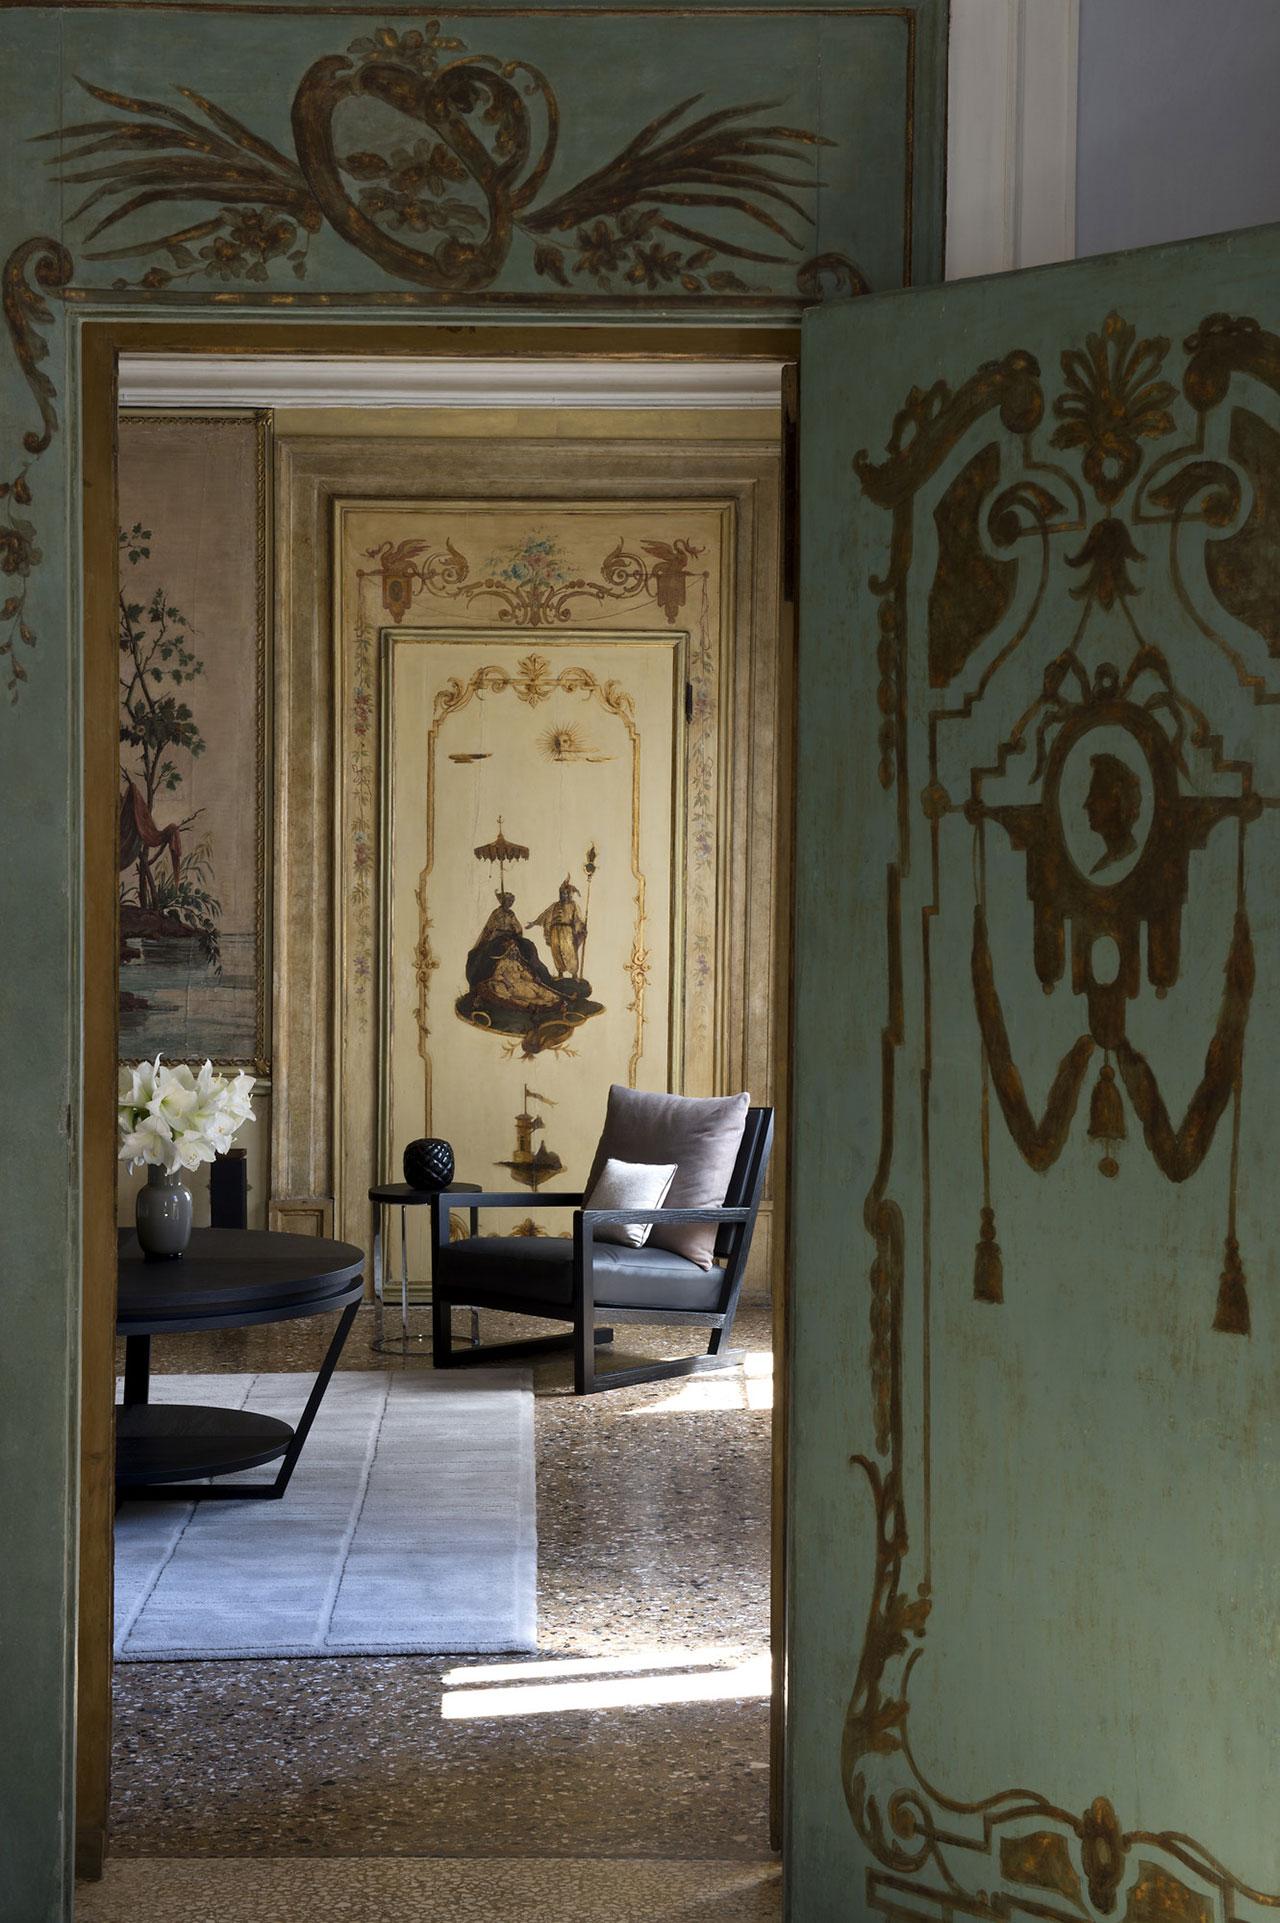 Alcova Tiepolo Suite, photo © Aman Canal Grande Hotel, Venice, Amanresorts.